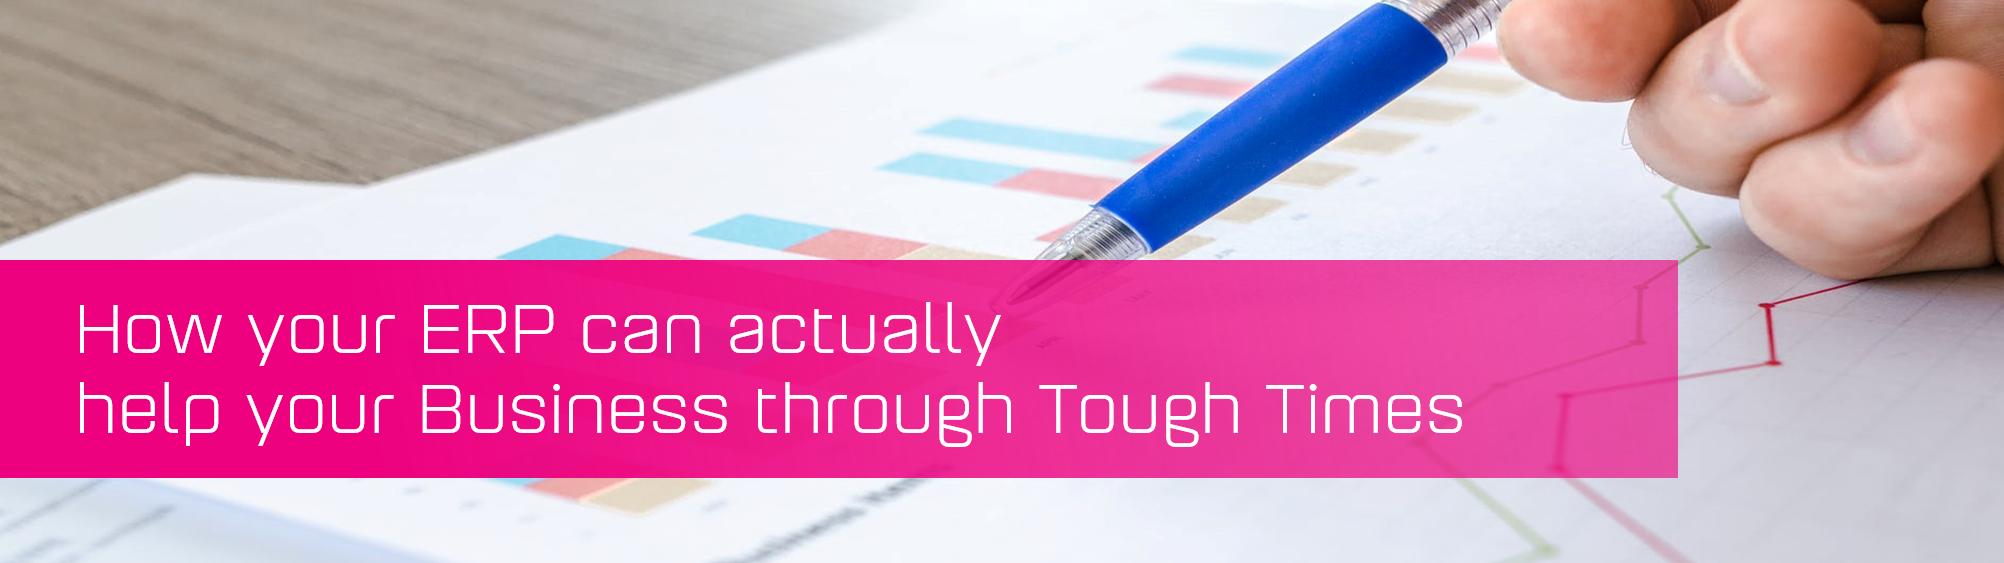 KCS SA - Blog - How your ERP can actually help your Business through Tough Times banner